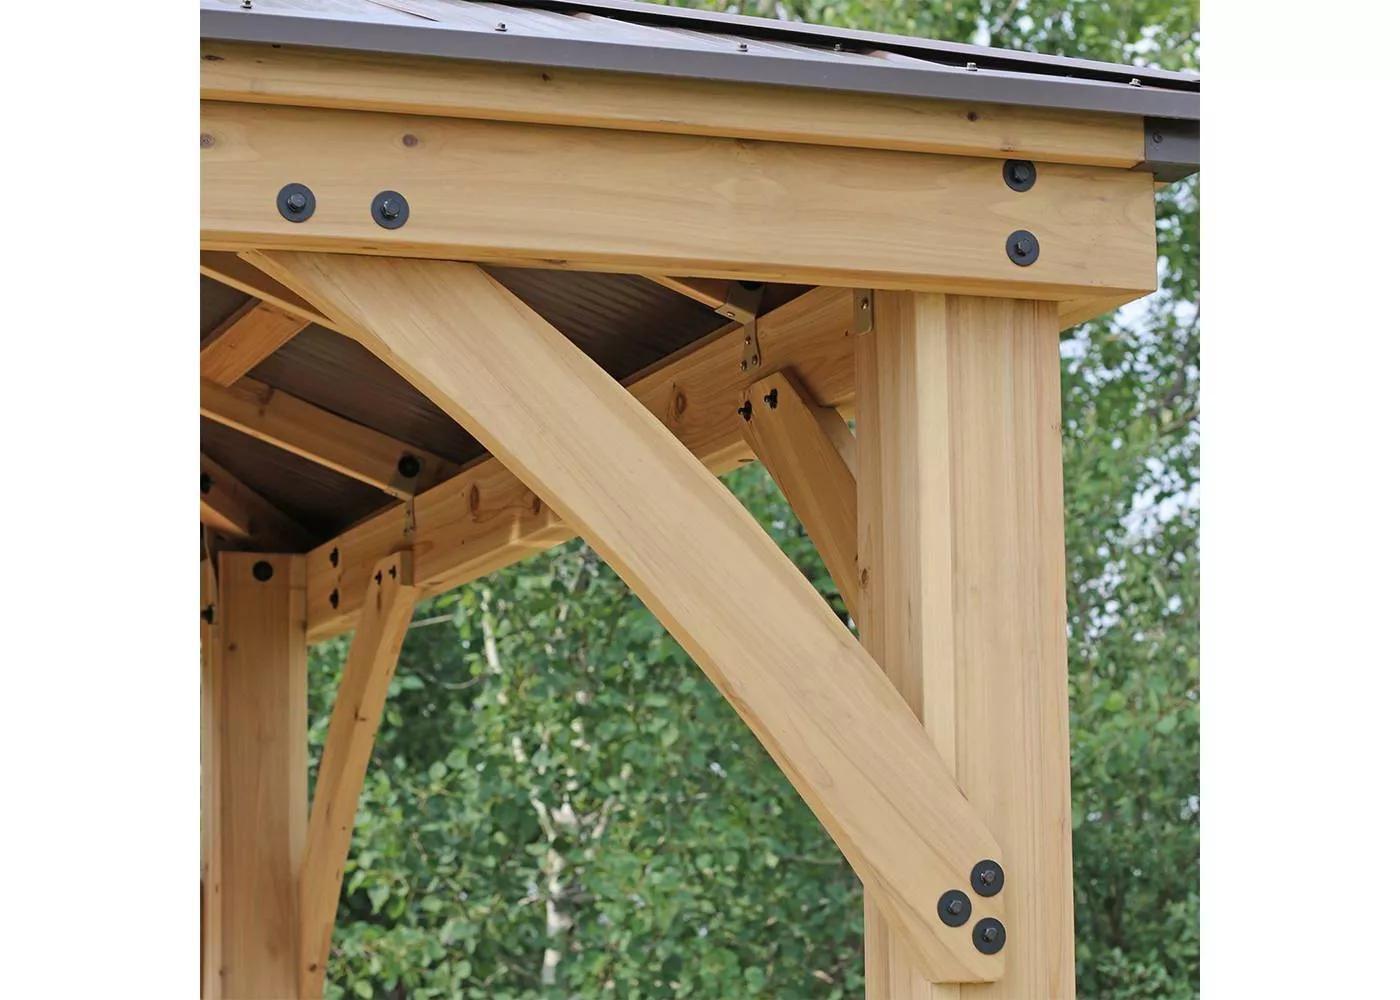 Meridian 10 X 10 Gazebo Brown Yardistry In 2020 Gazebo Wooden Gazebo Backyard Spaces